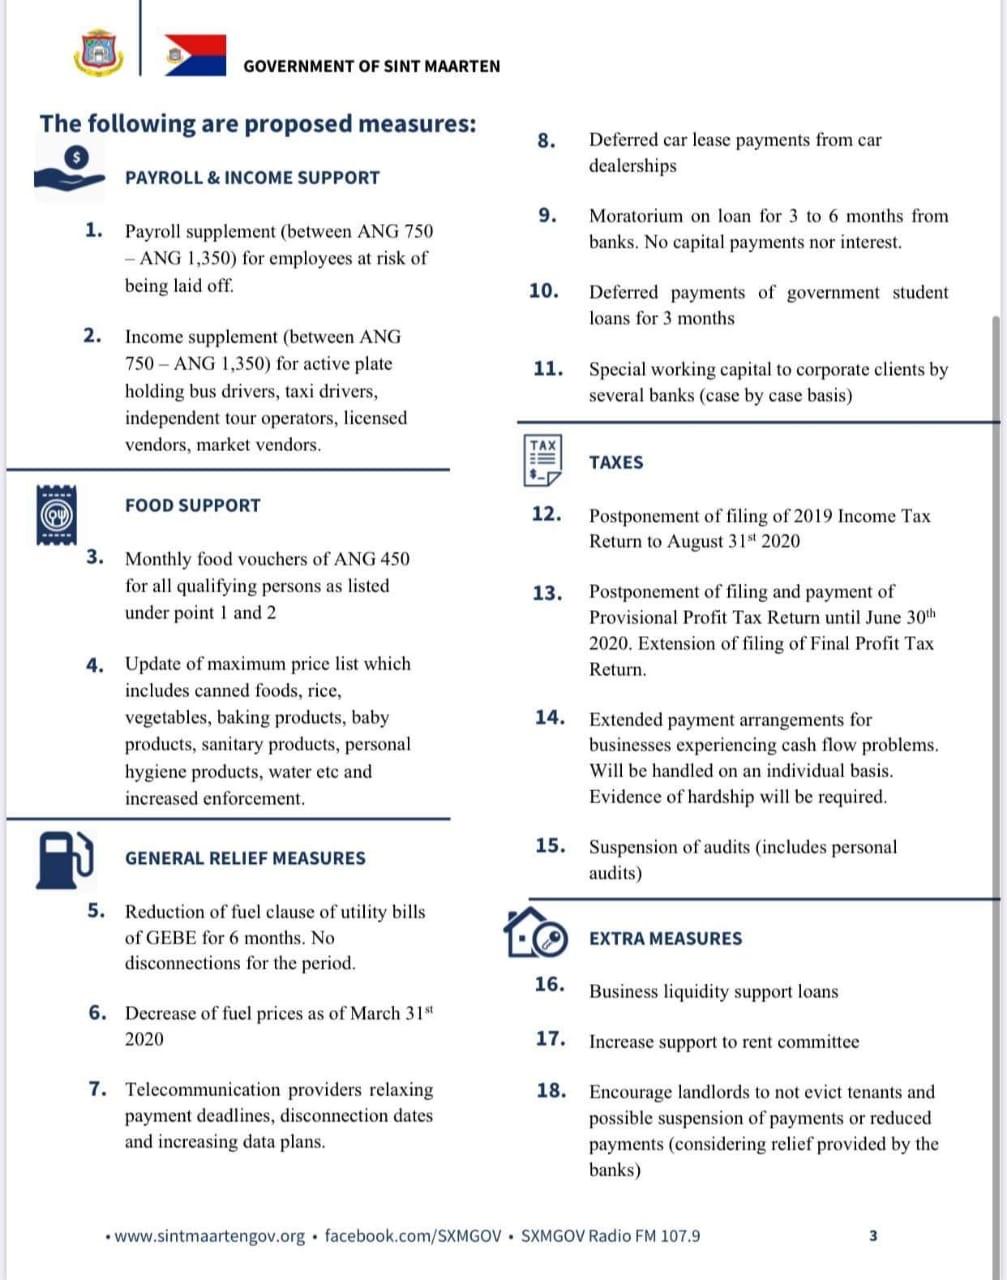 Stimulus Plan Infographic